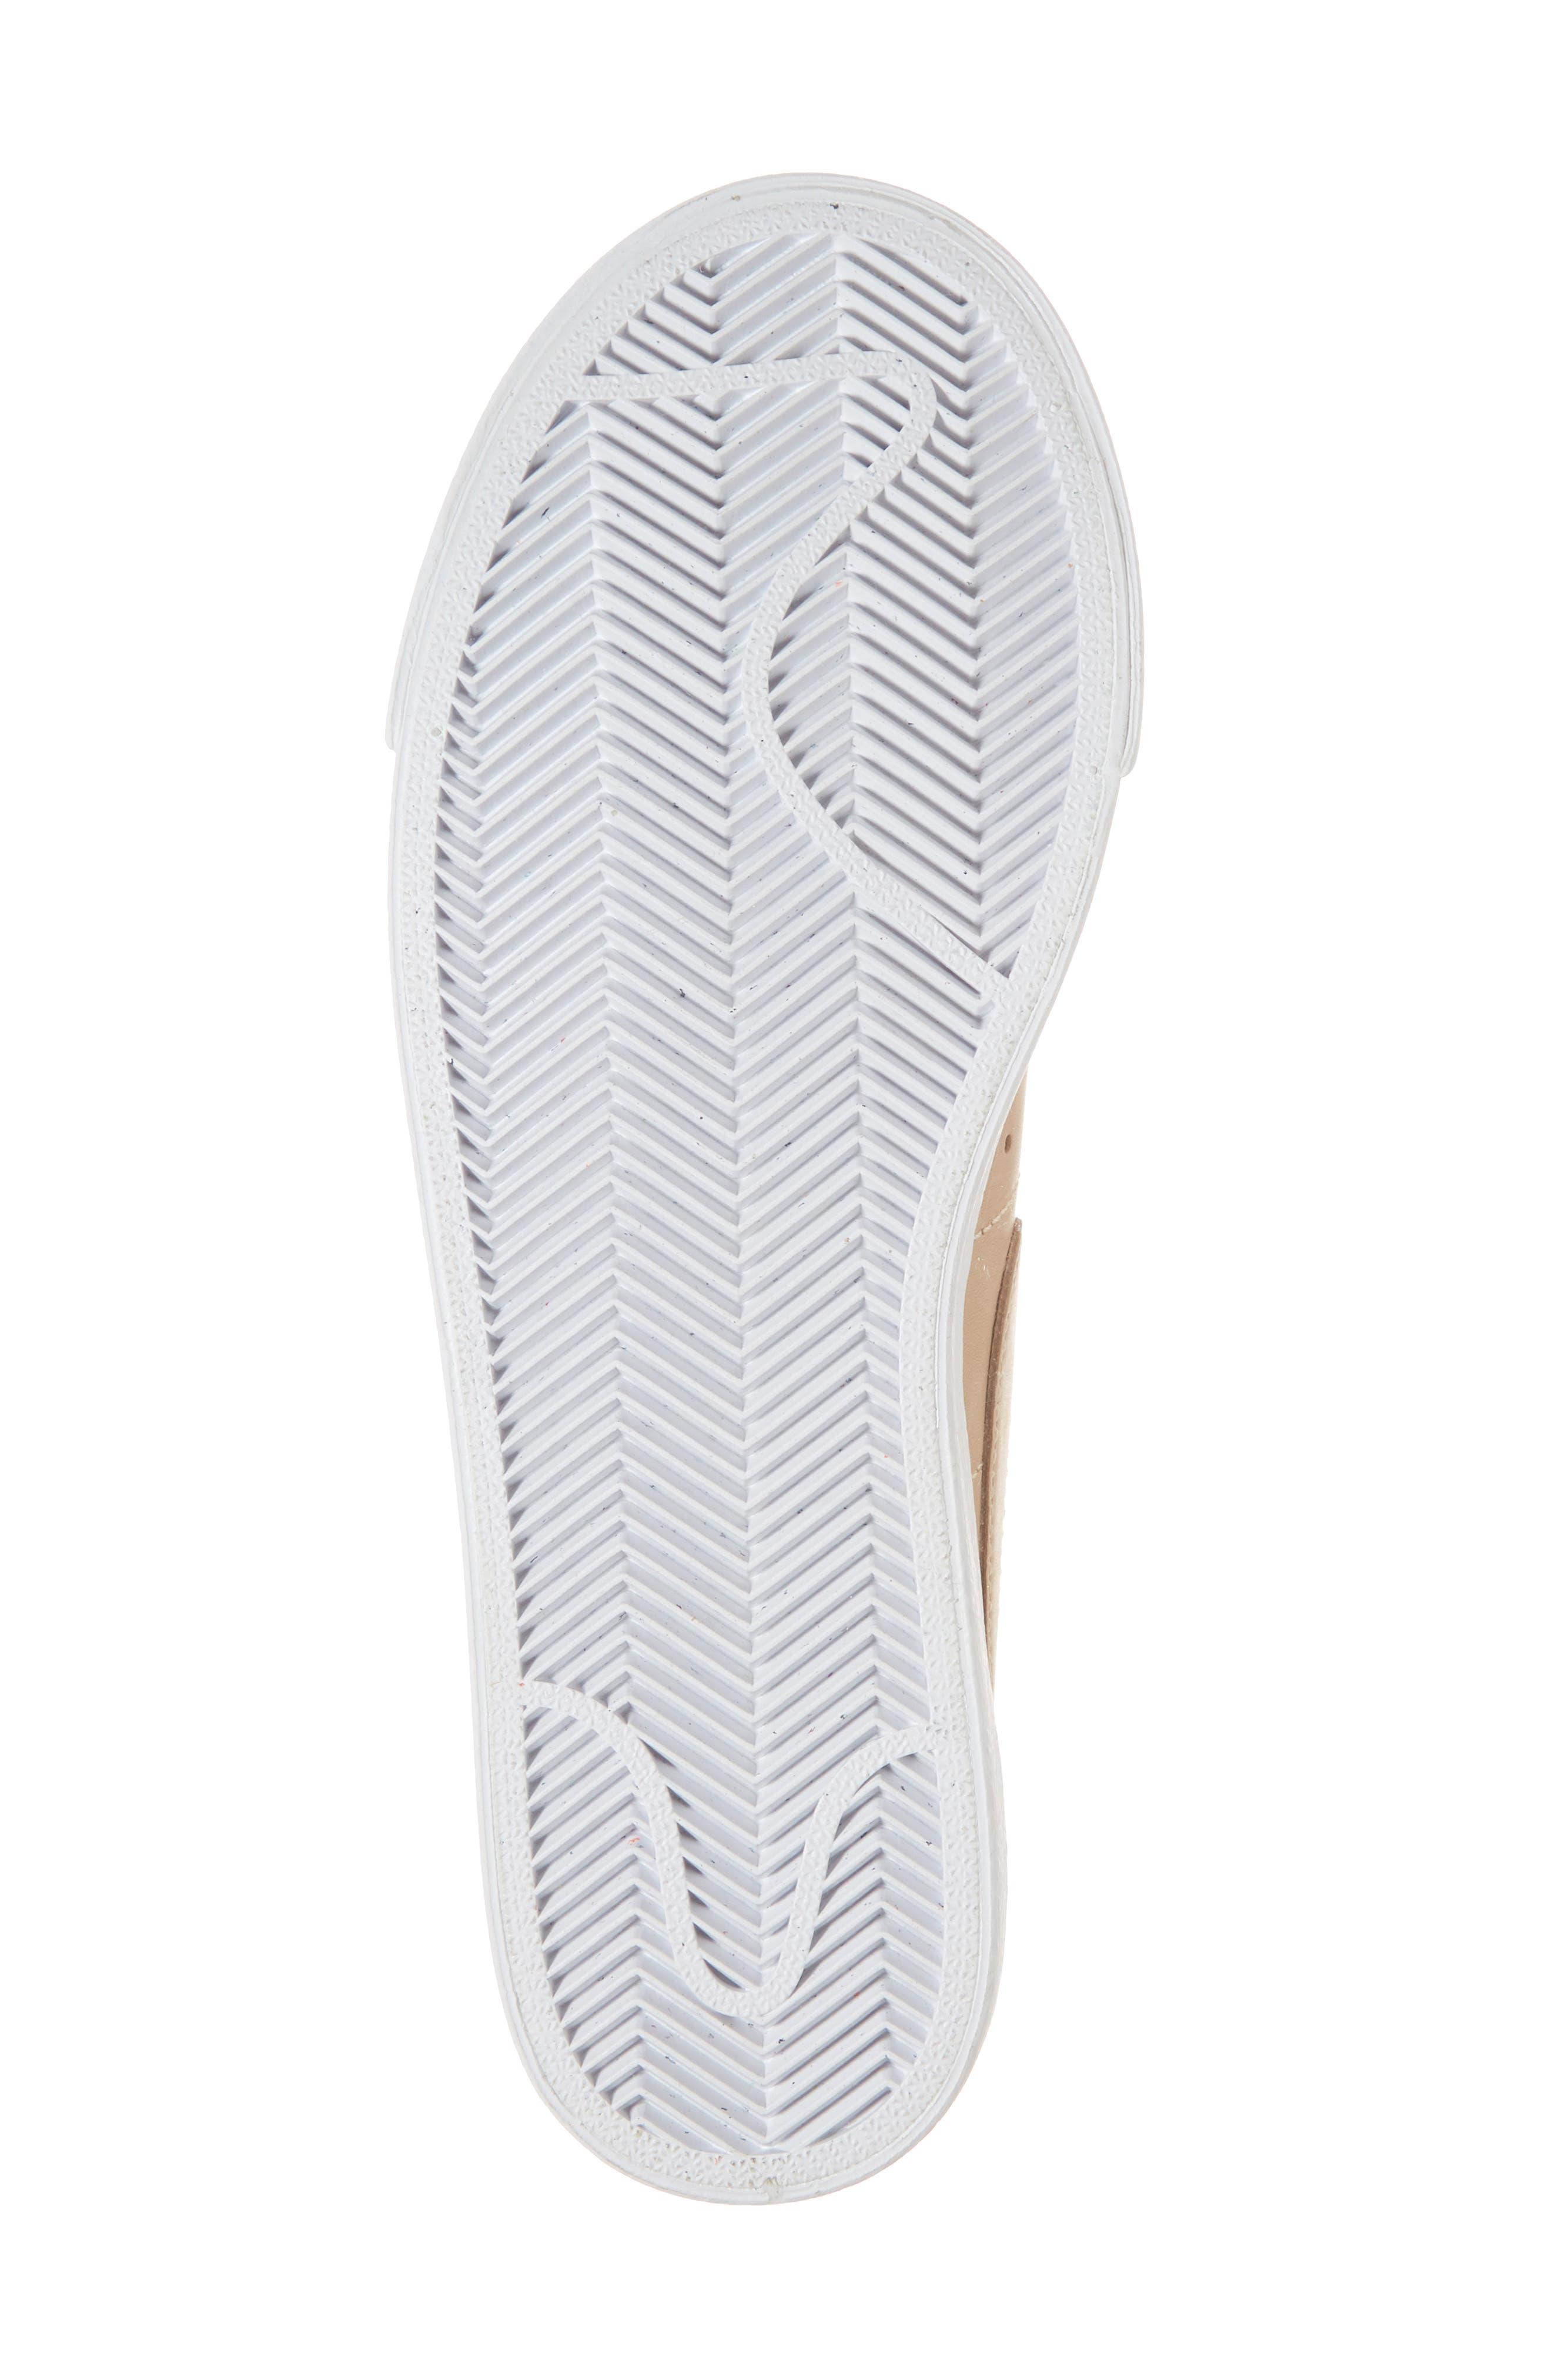 Blazer Low Top Sneaker SE,                             Alternate thumbnail 6, color,                             BIO BEIGE/ BIO BEIGE